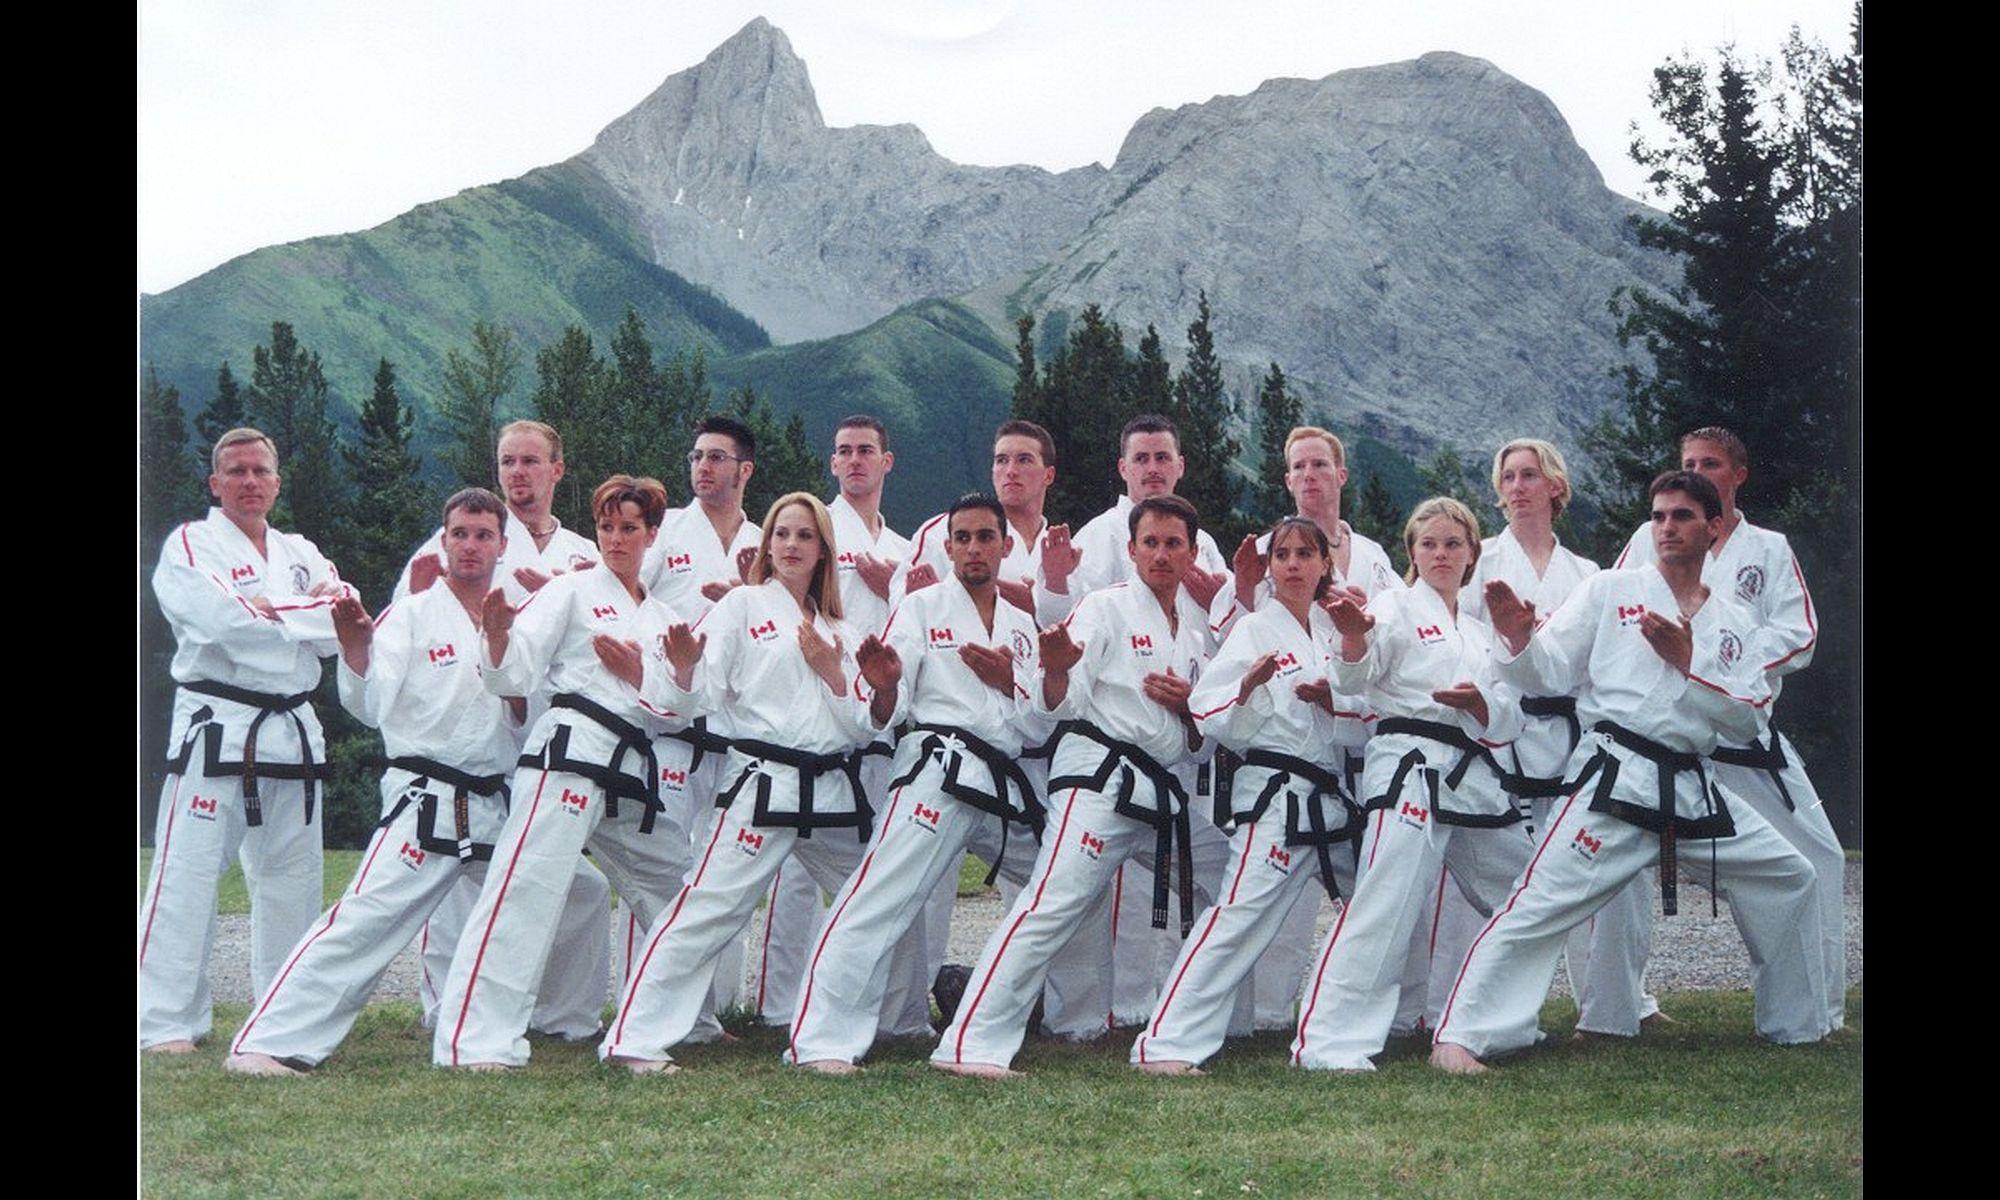 Unified TaeKwon-Do International